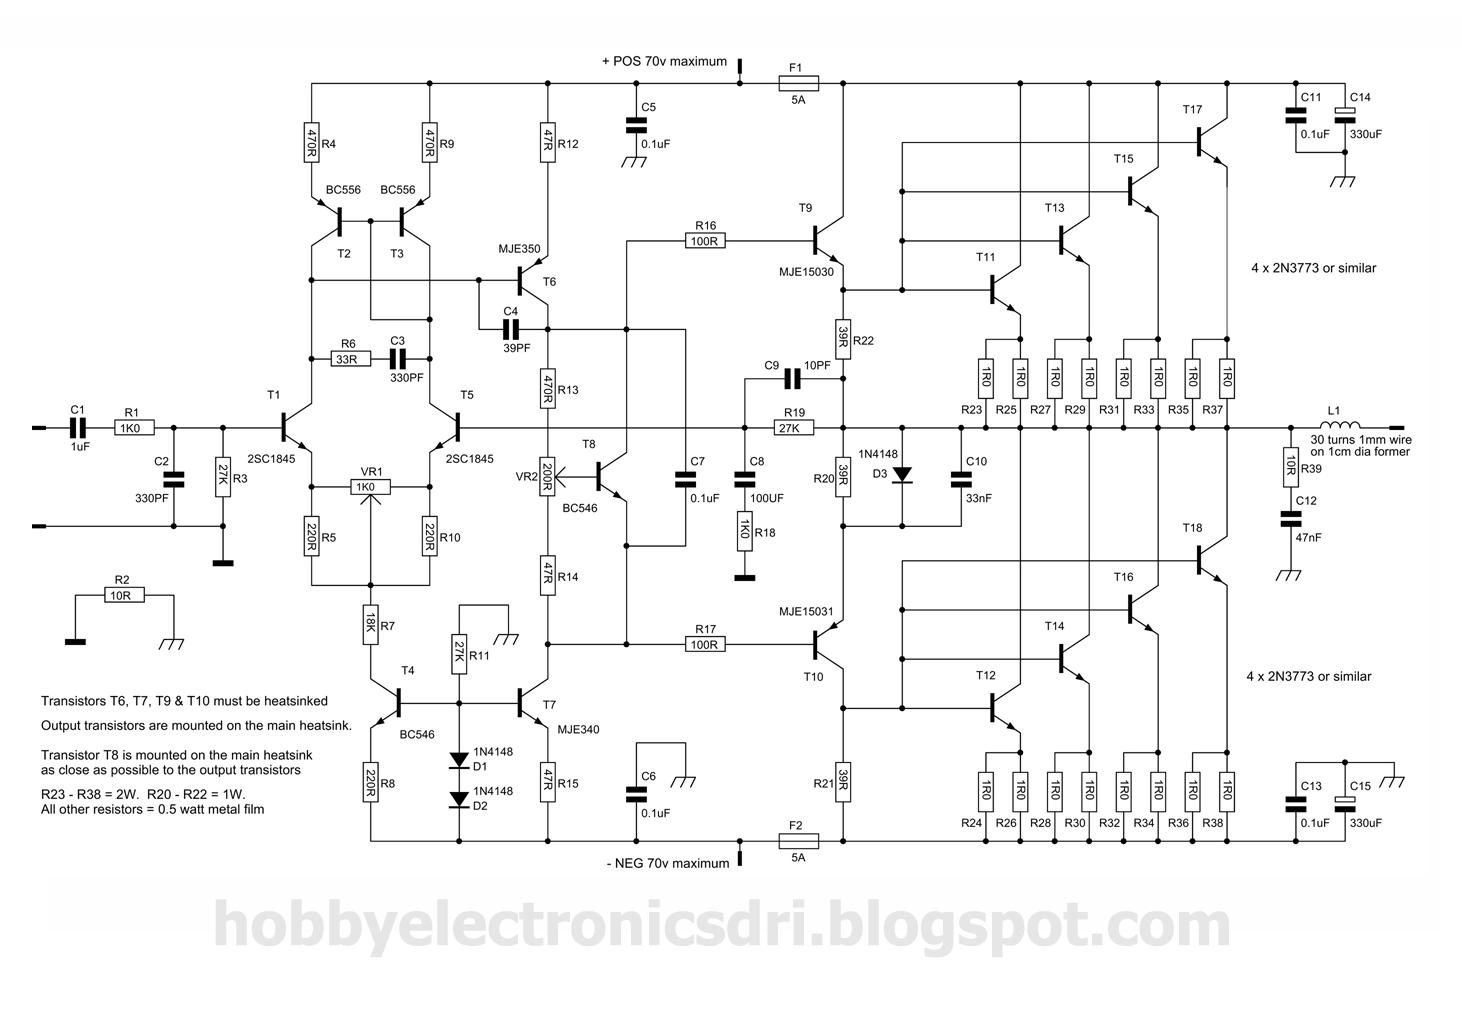 300 Watt Amplifier Circuit Diagram Wiring And Ebooks La4440 Audio Quasi With 2n3773 Rh Hobbyelectronicsdri Blogspot Com